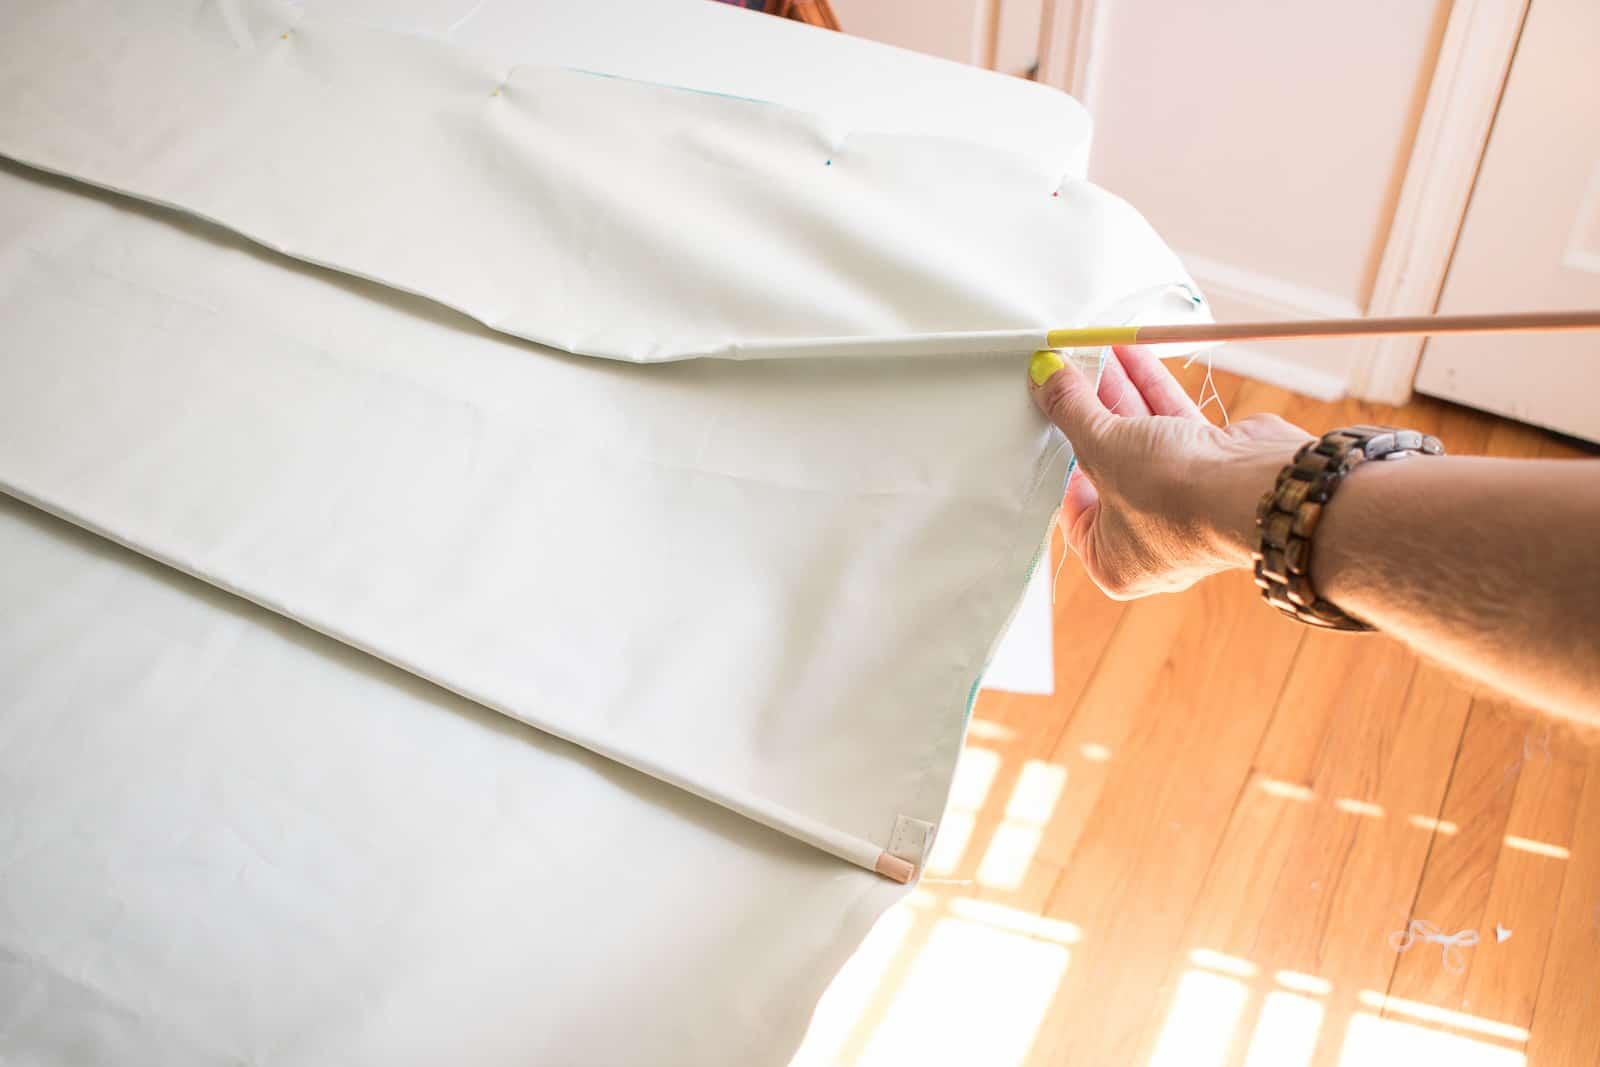 insert dowels into dowel pockets